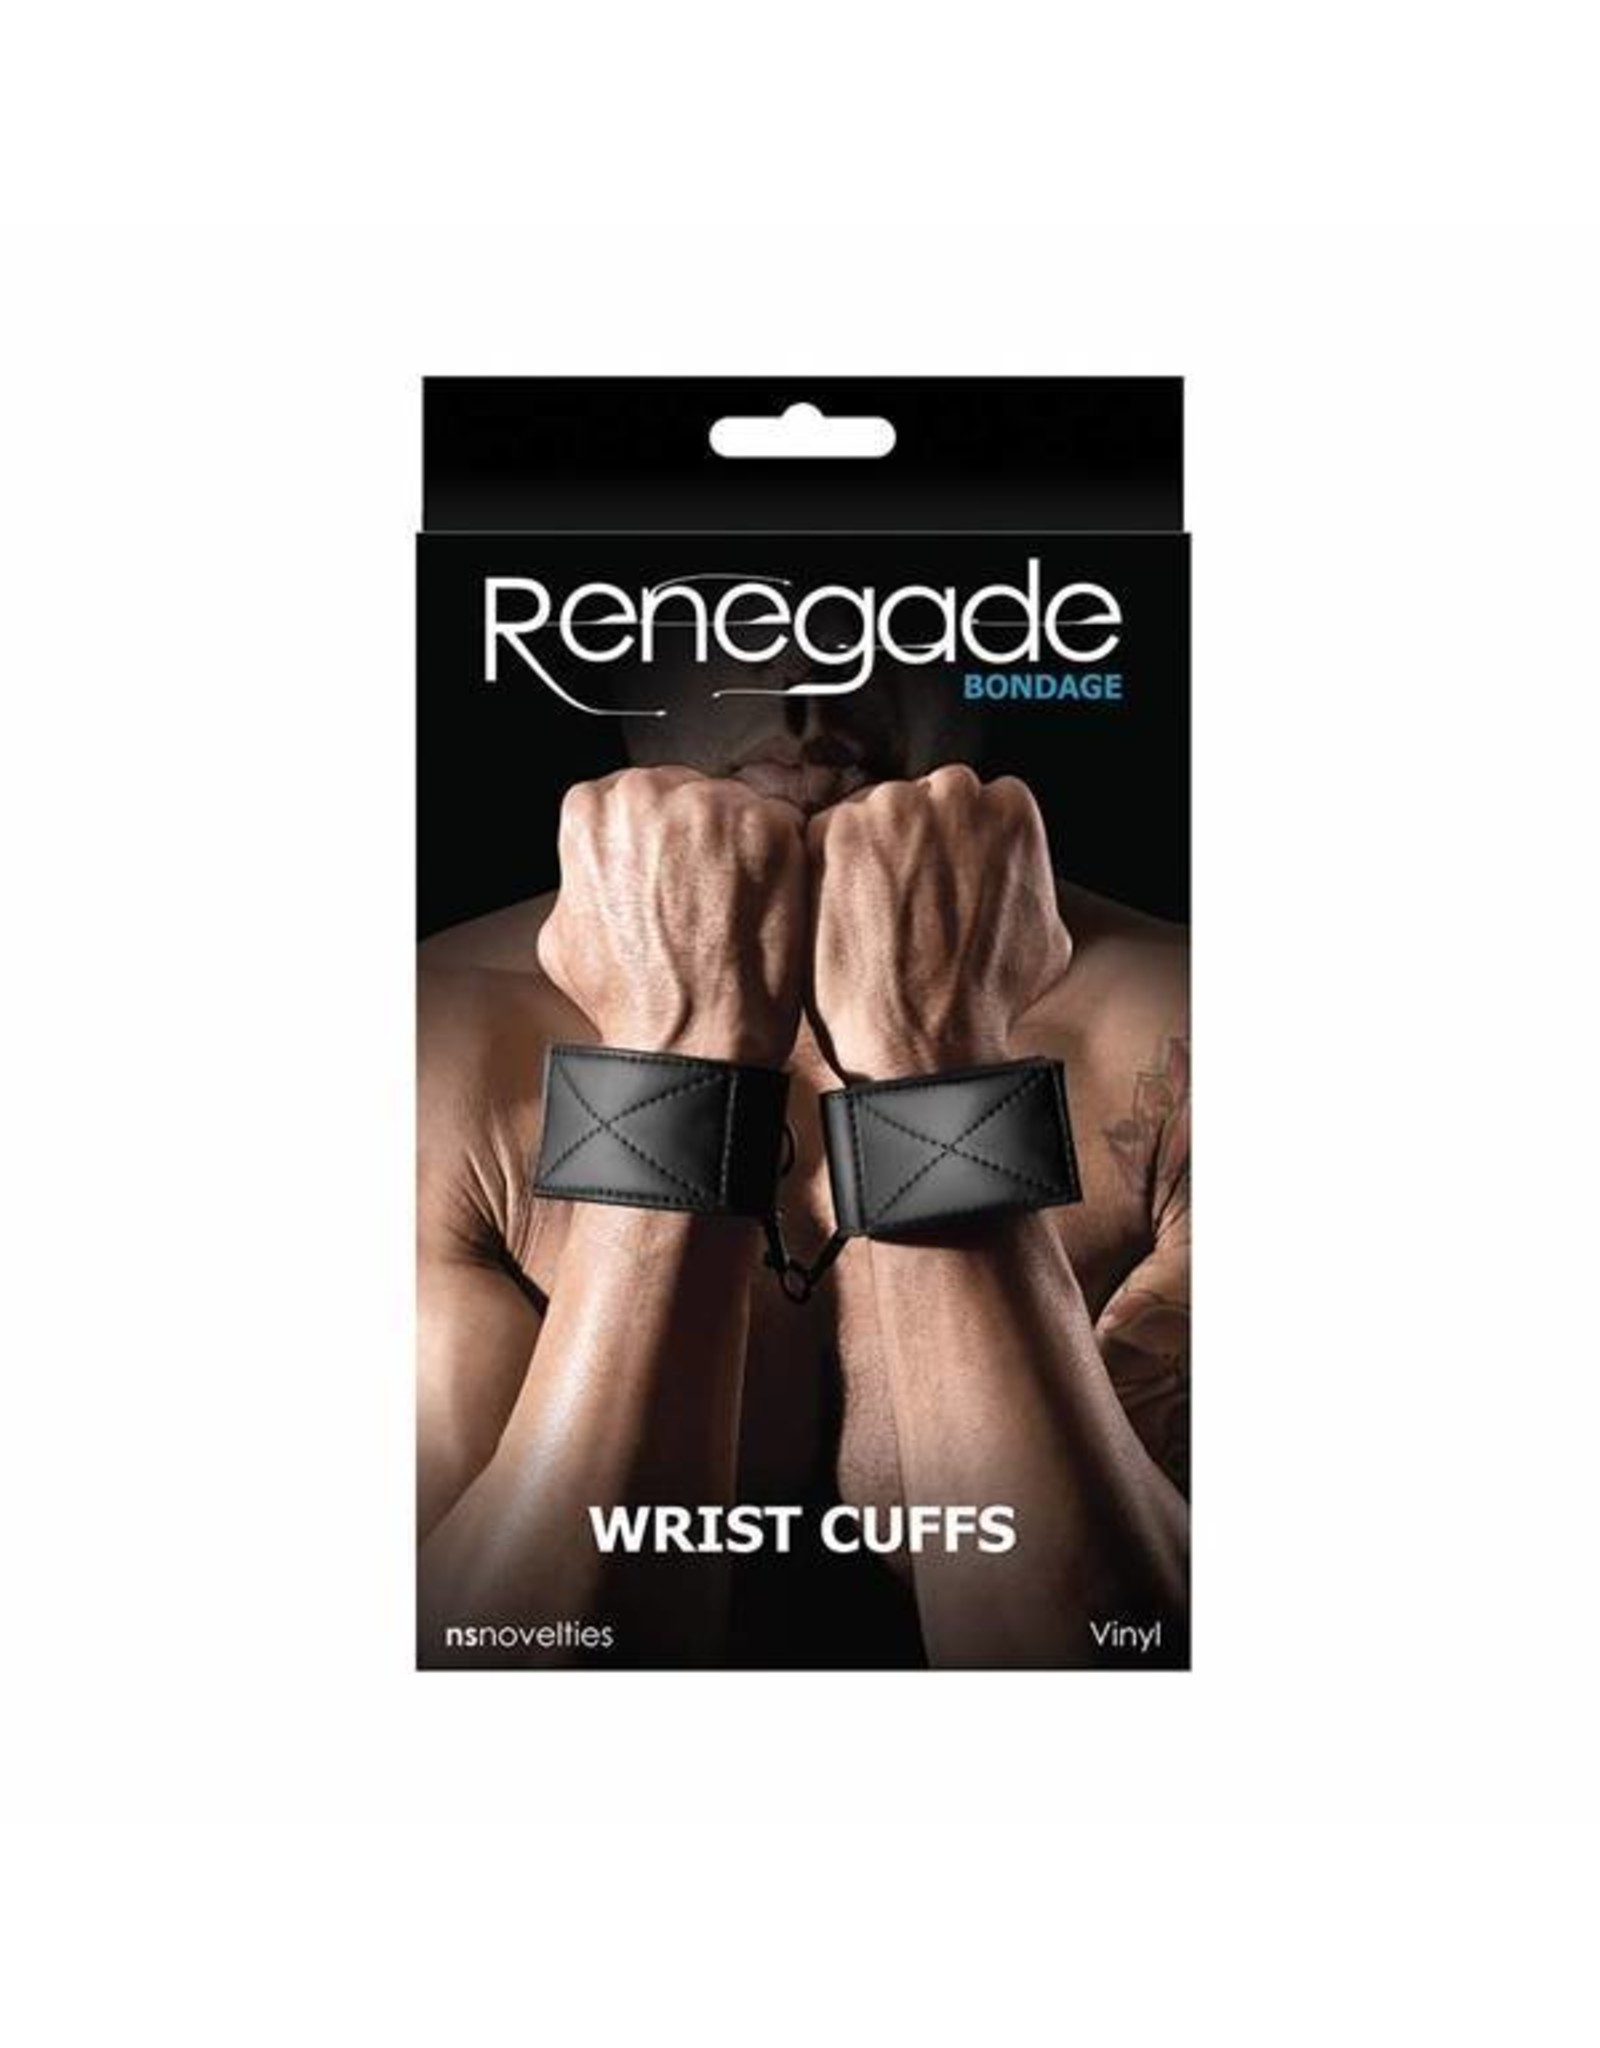 Renegade Renegade Bondage Handfesseln